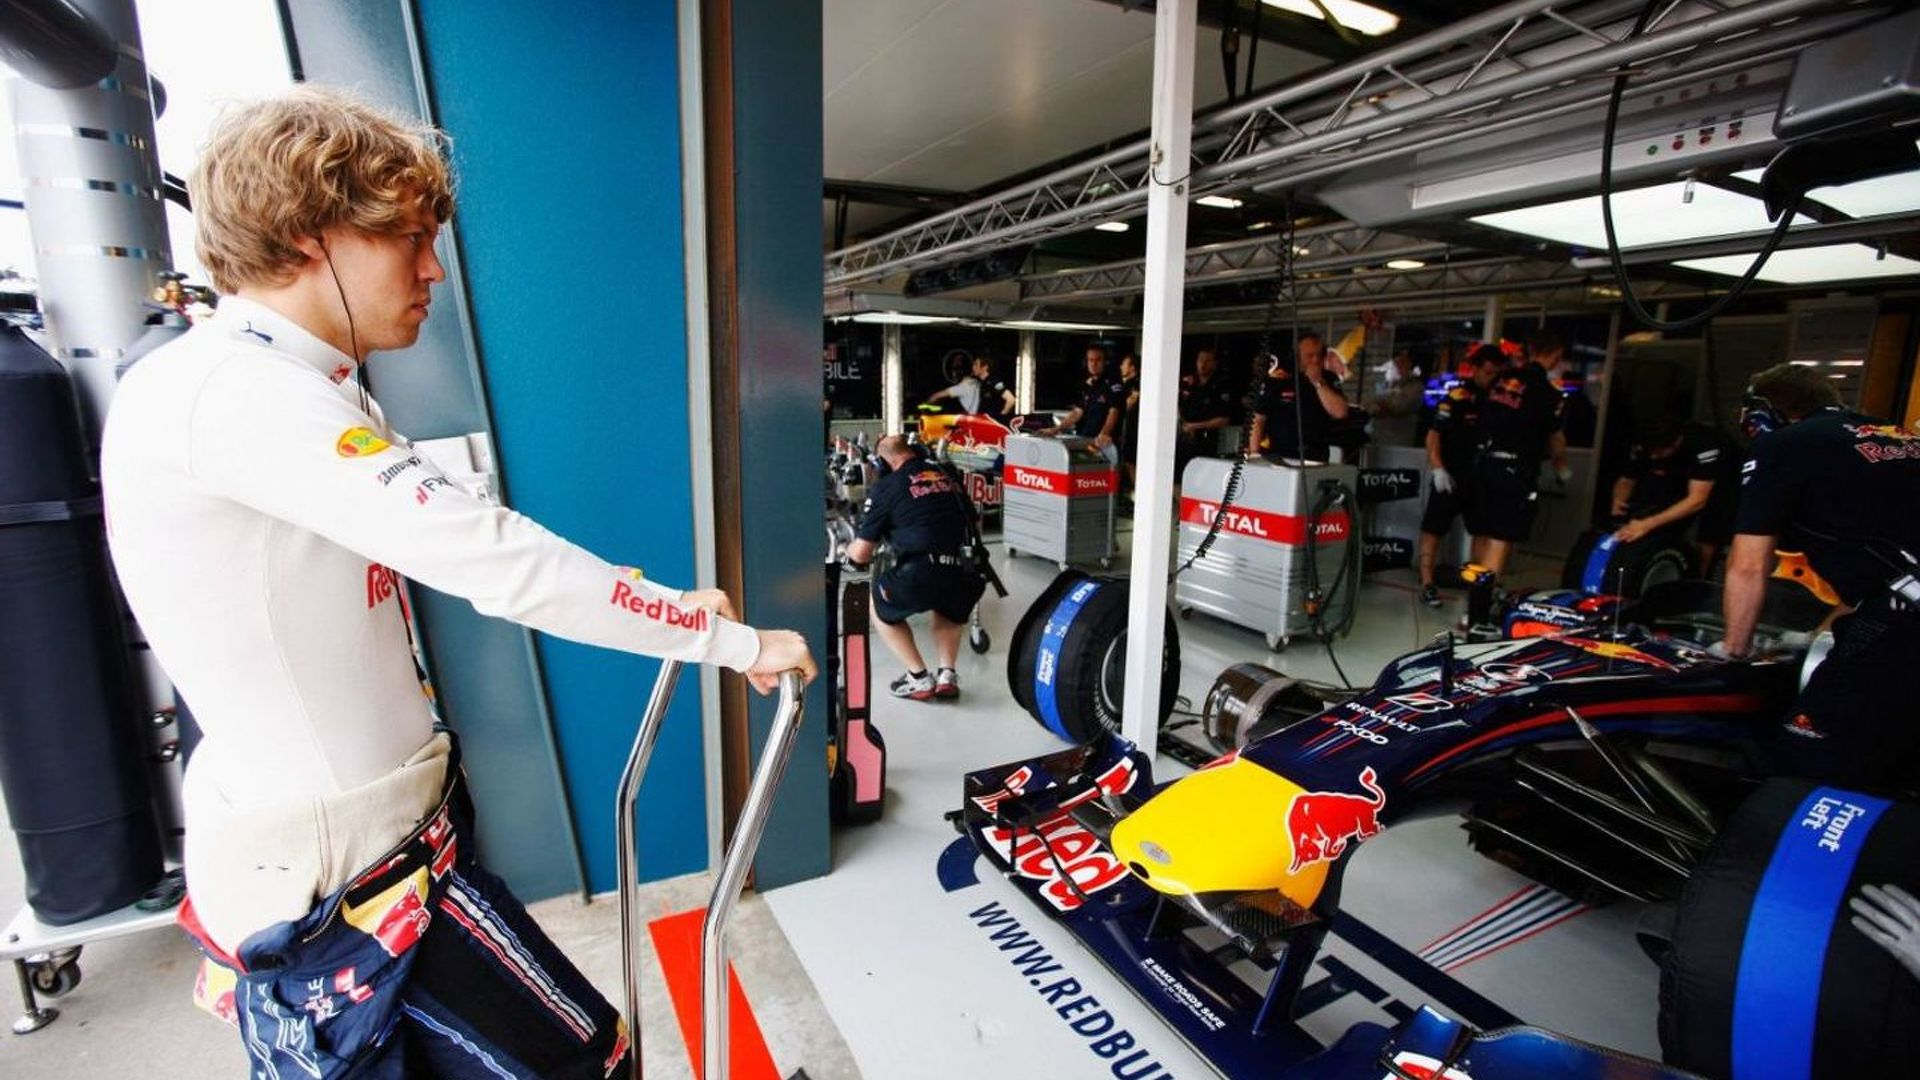 Vettel defect revealed - wheel damaged by loose nut